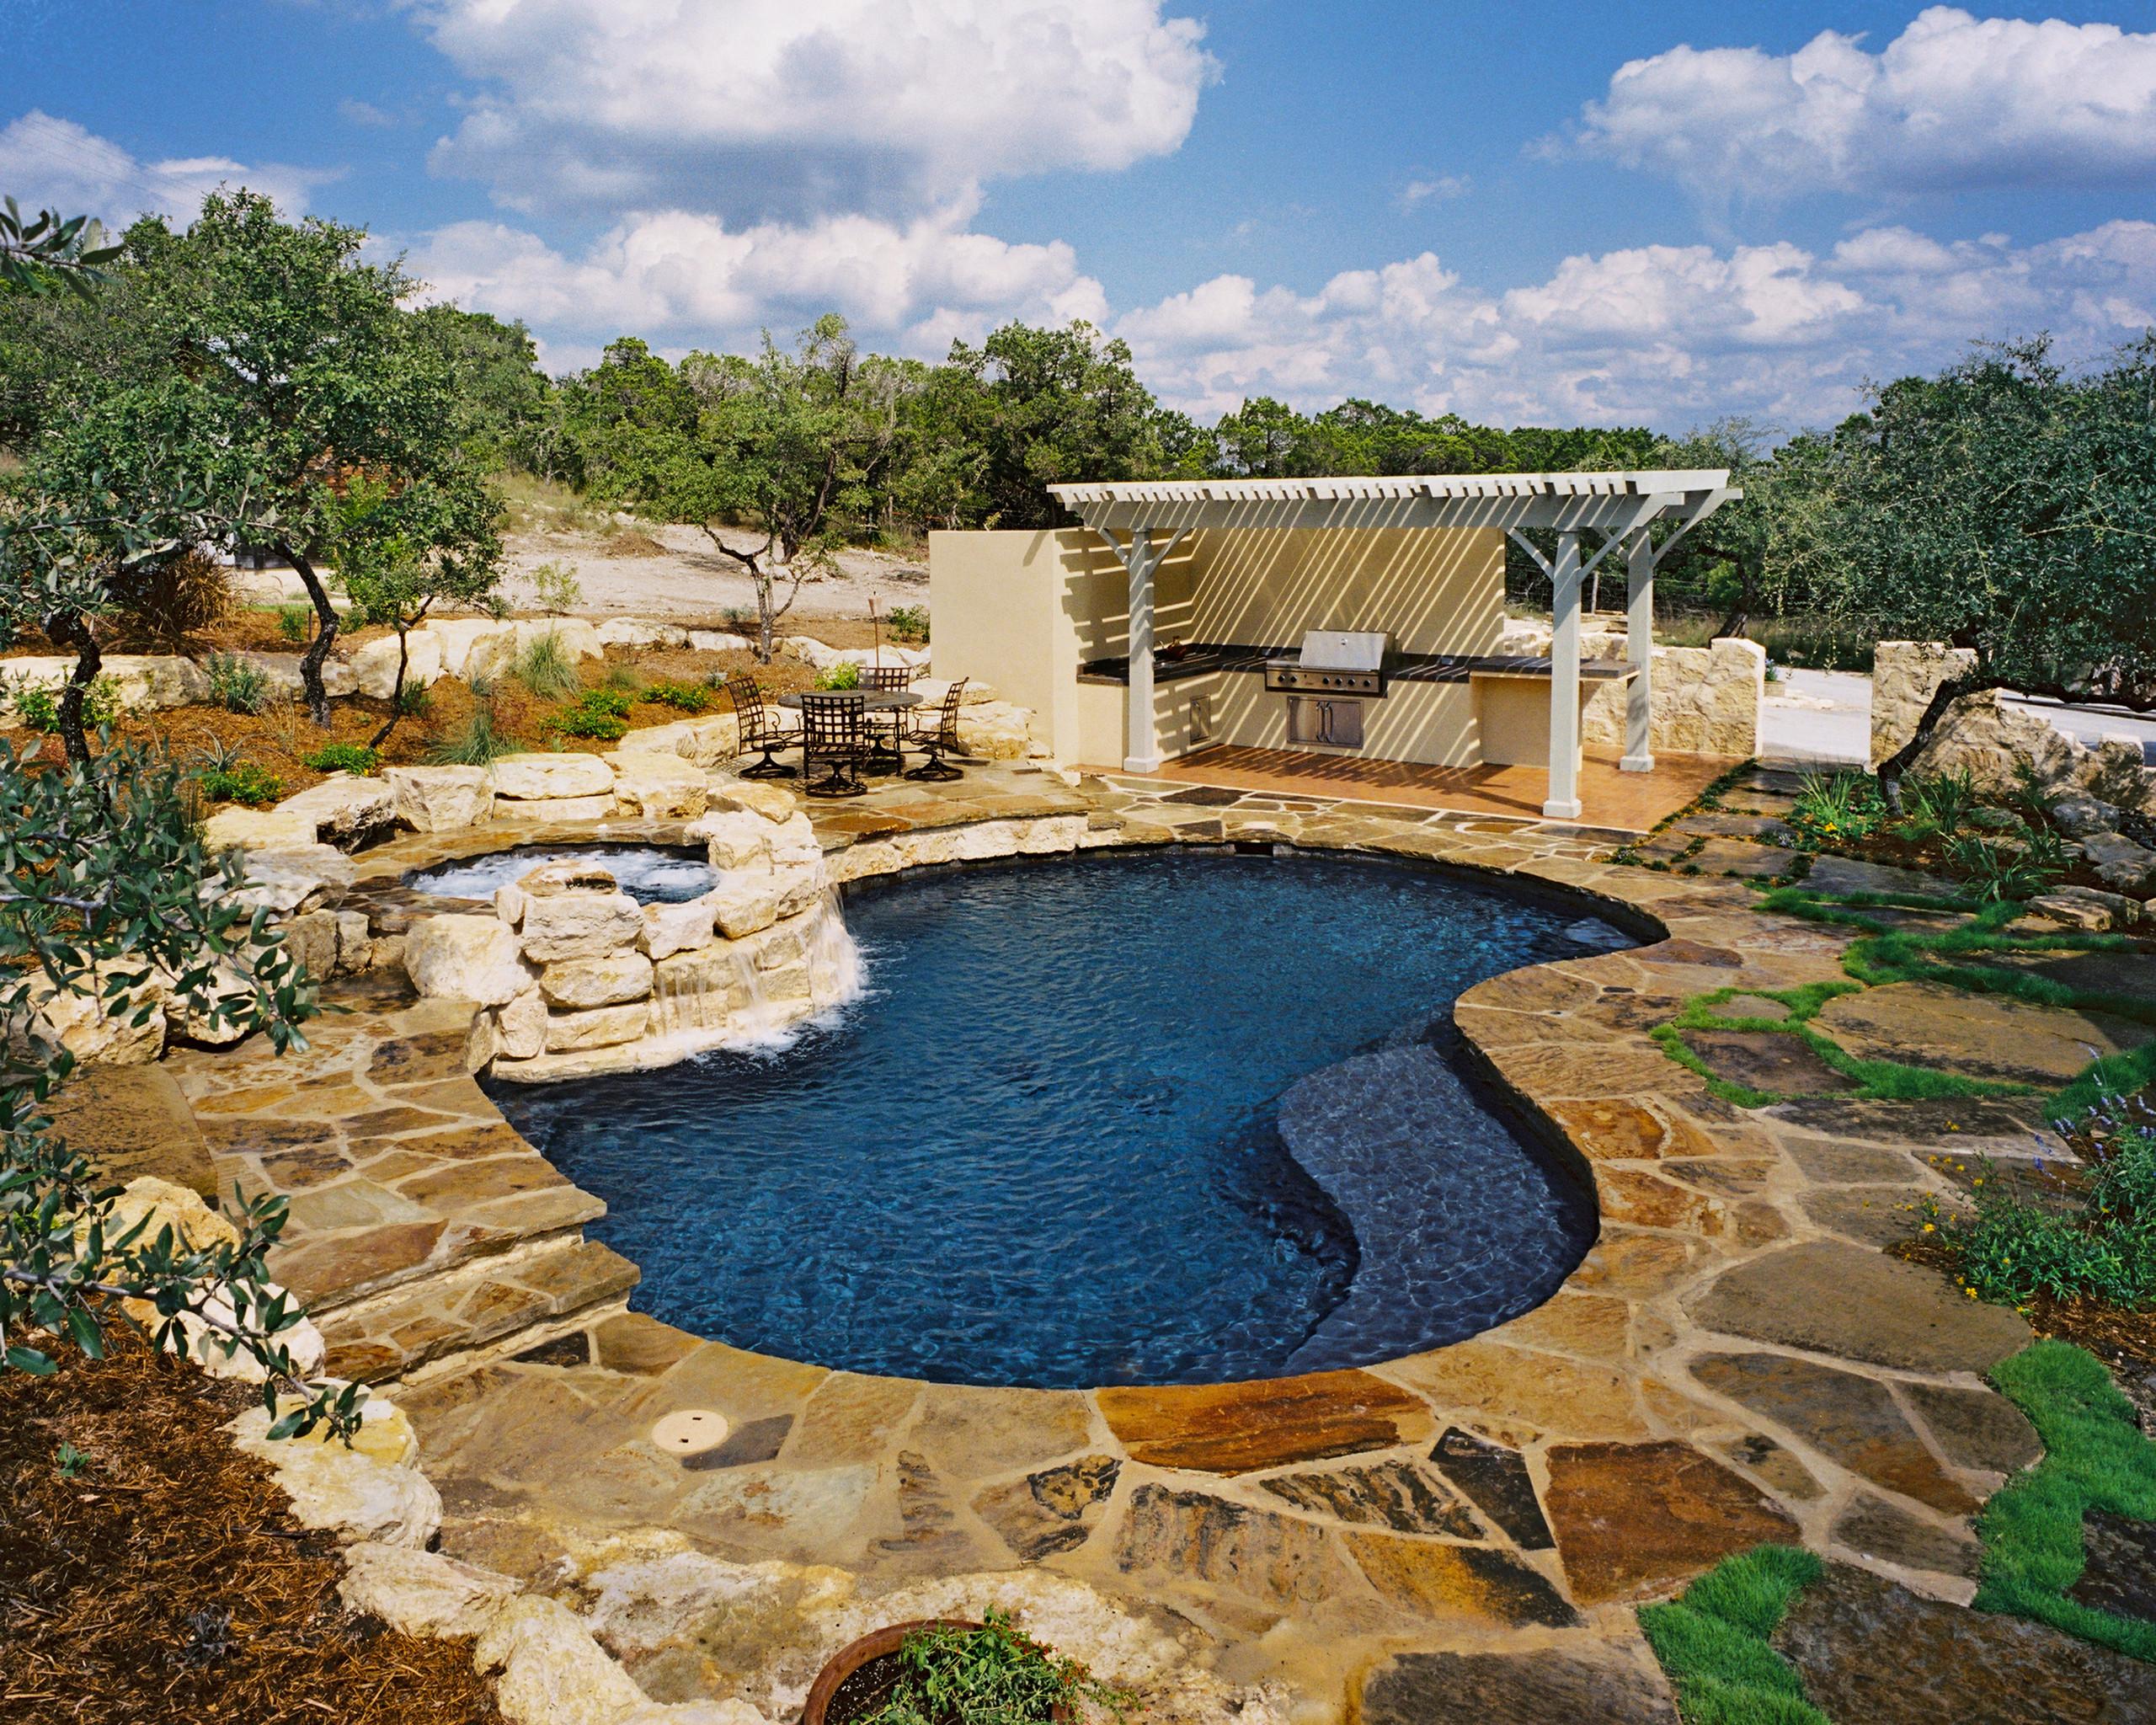 Boerne Natural/Freeform Pool/Spa/Outdoor Kitchen/Arbor